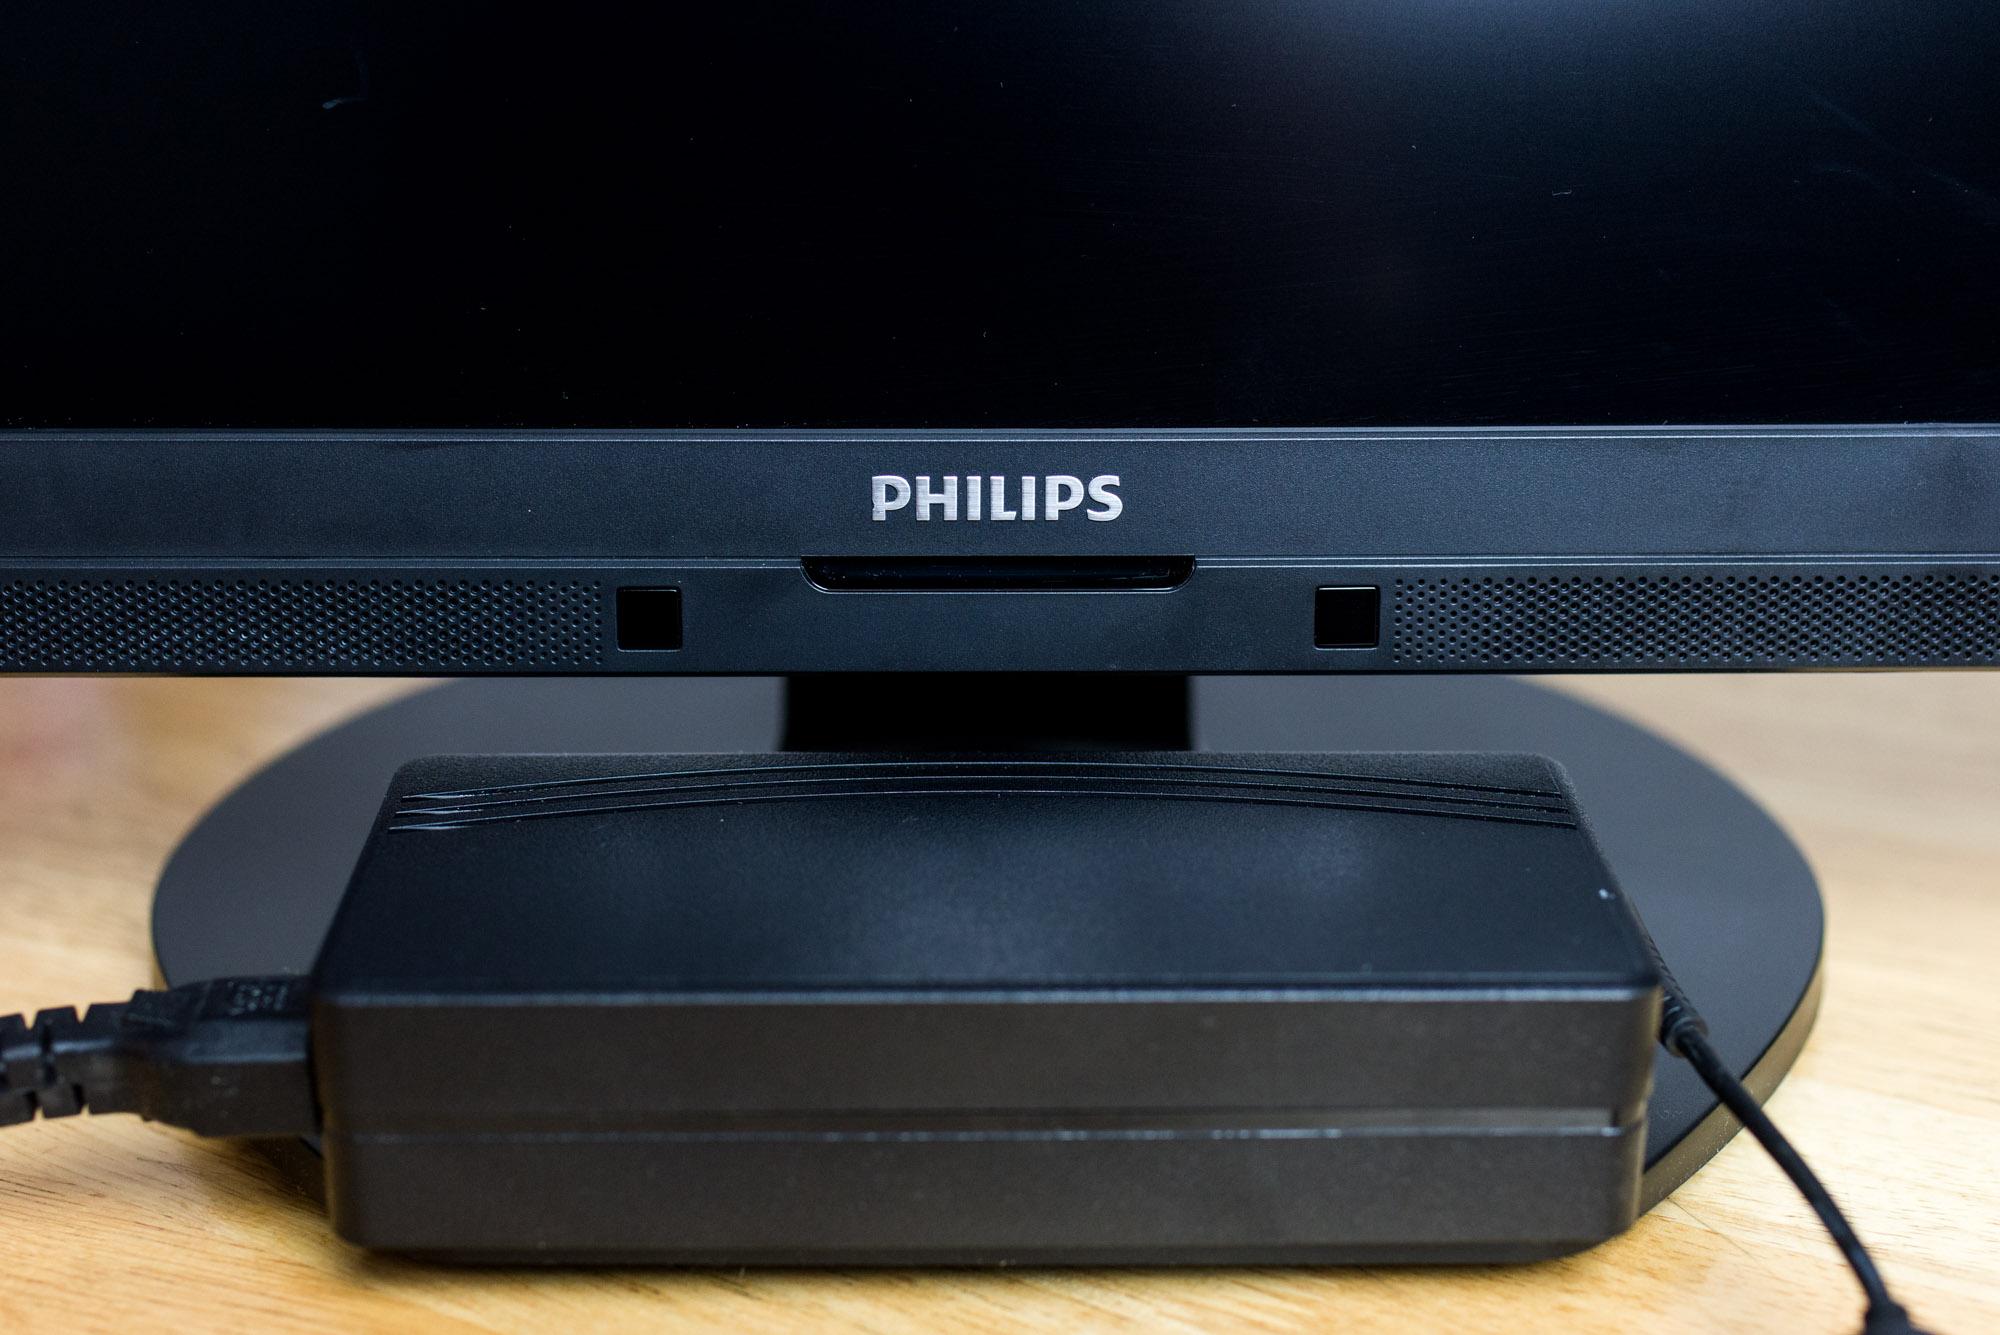 phillips-241p6bvpjkeb-13